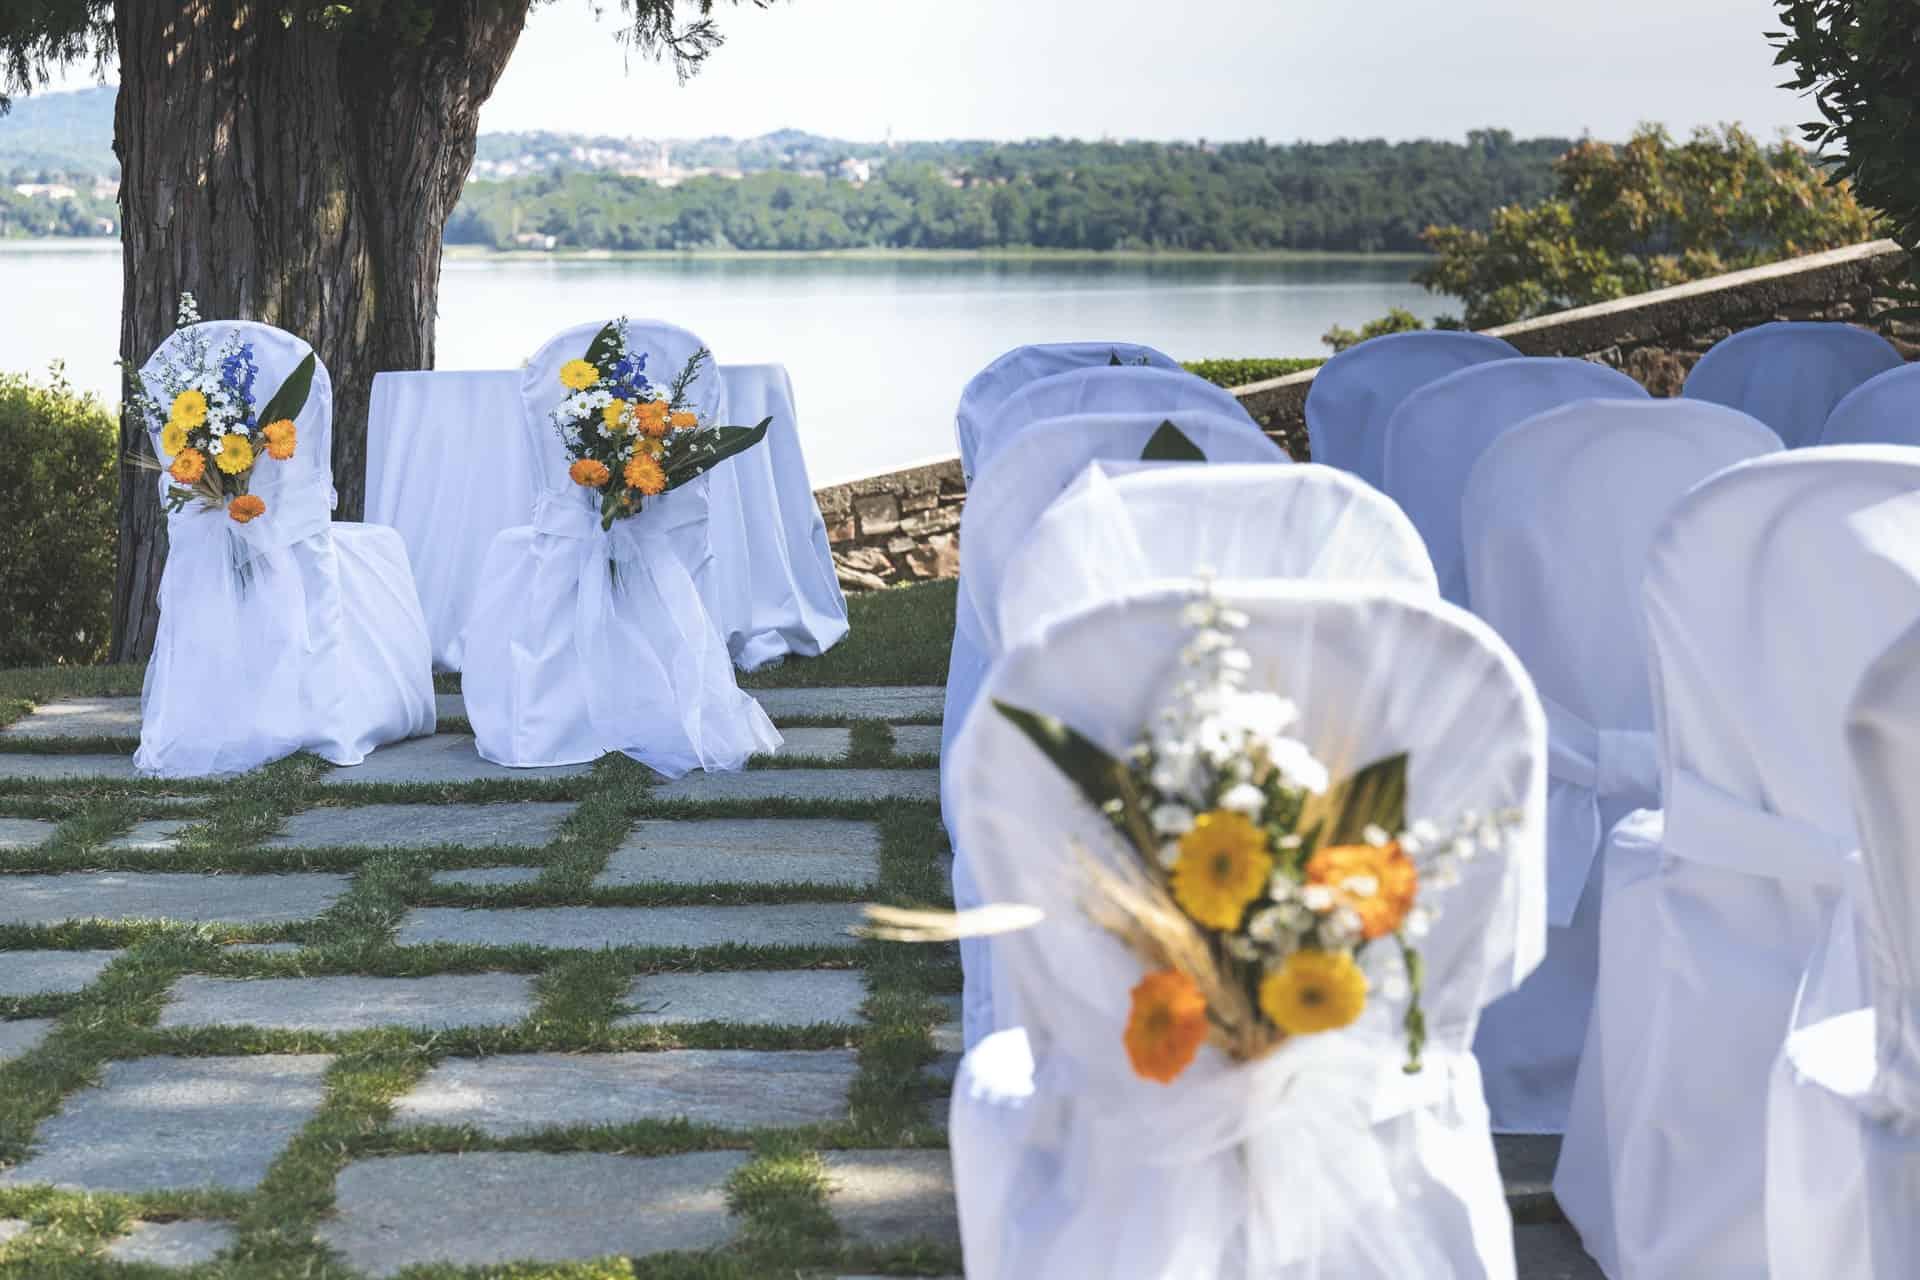 Italian Wedding traditions and wedding decoration - The Proud Italian